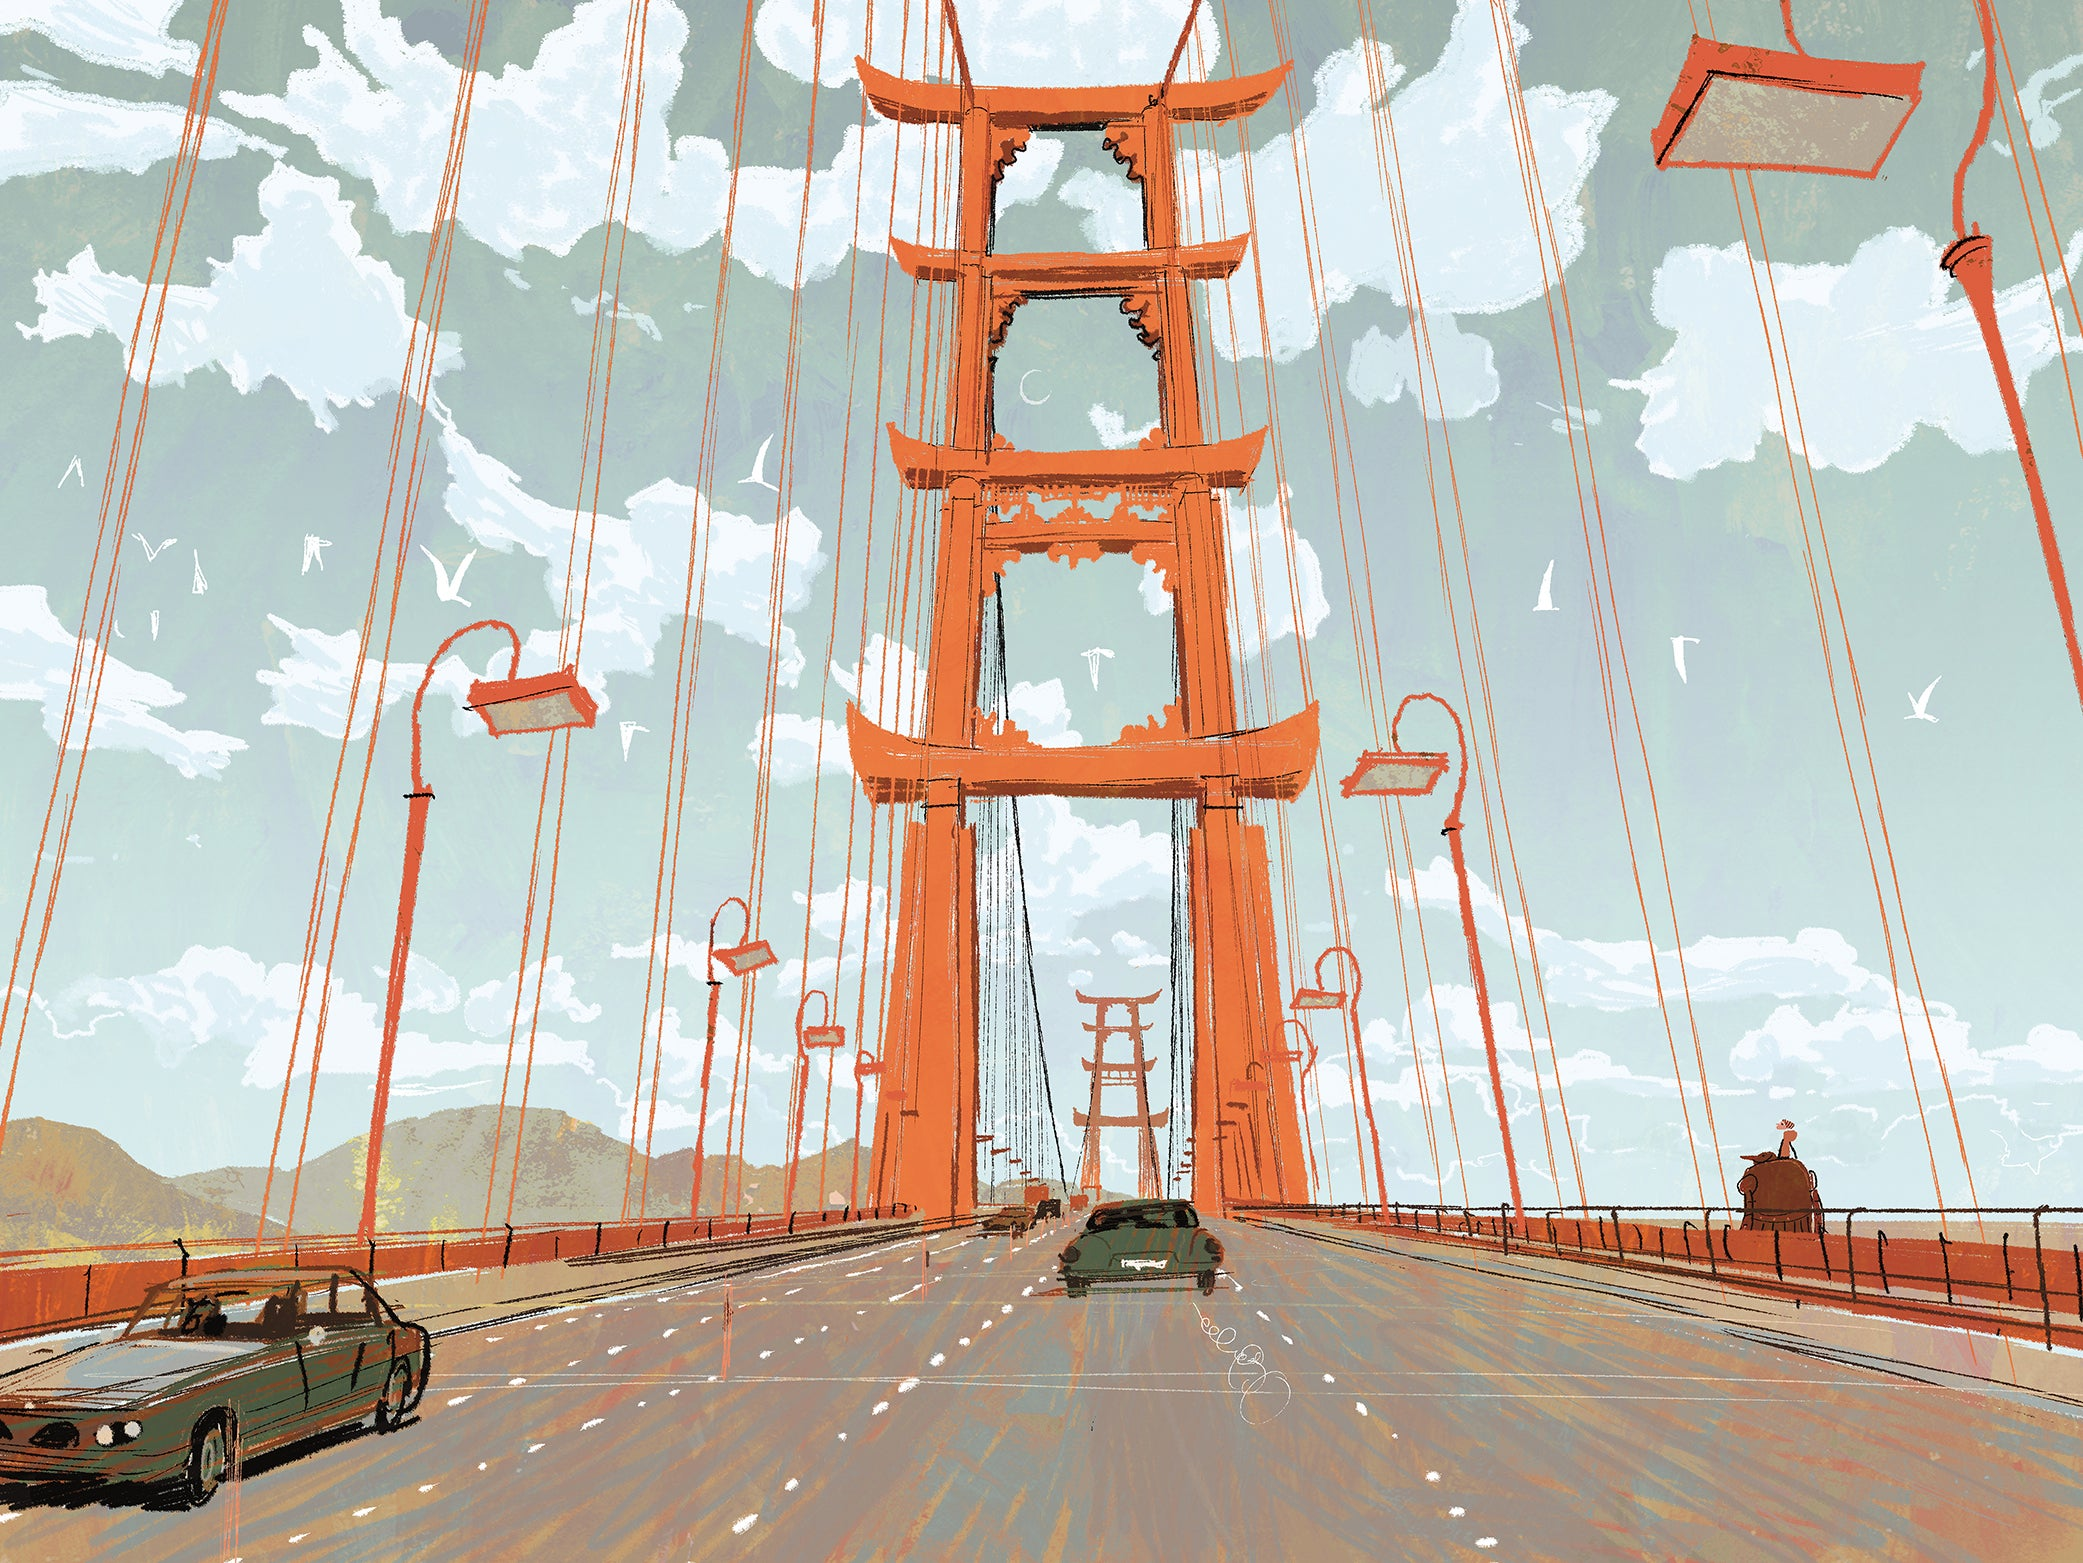 A Tour of 'San Fransokyo,' the Hybrid City Disney Built for Big Hero 6